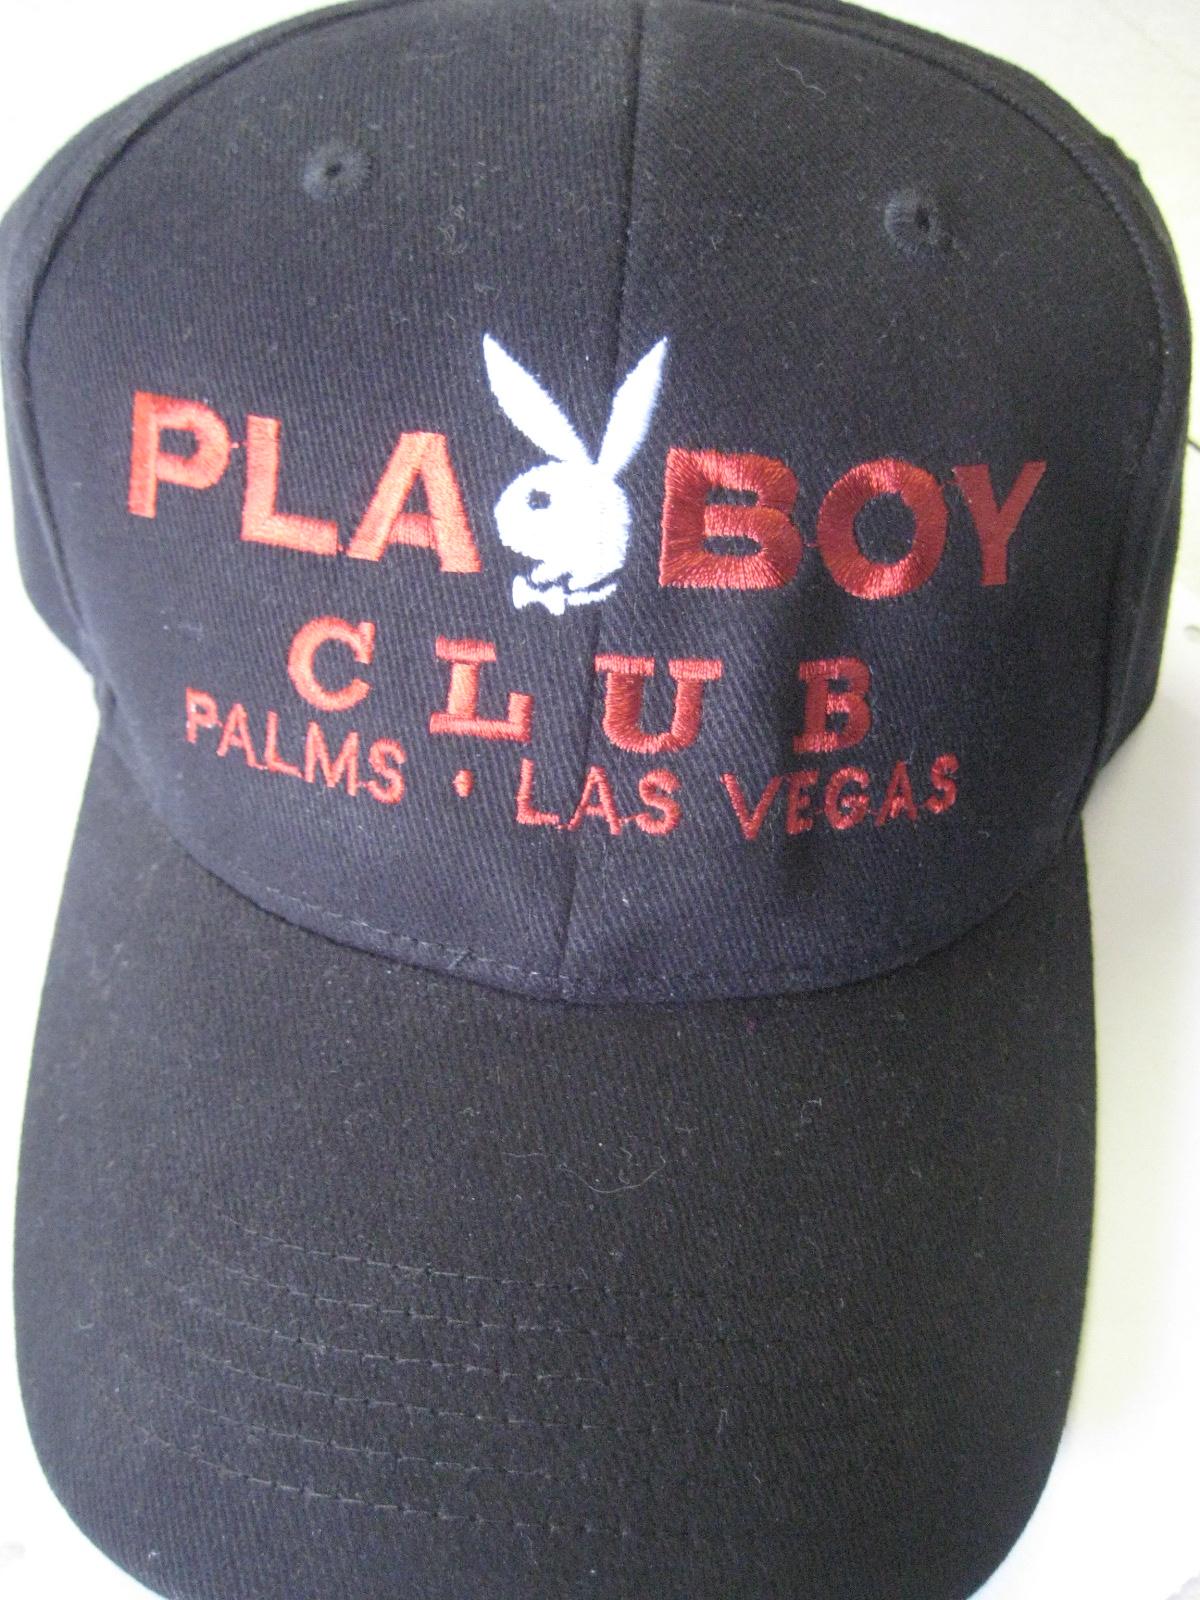 Playboy Club Palms Las Vegas Hat